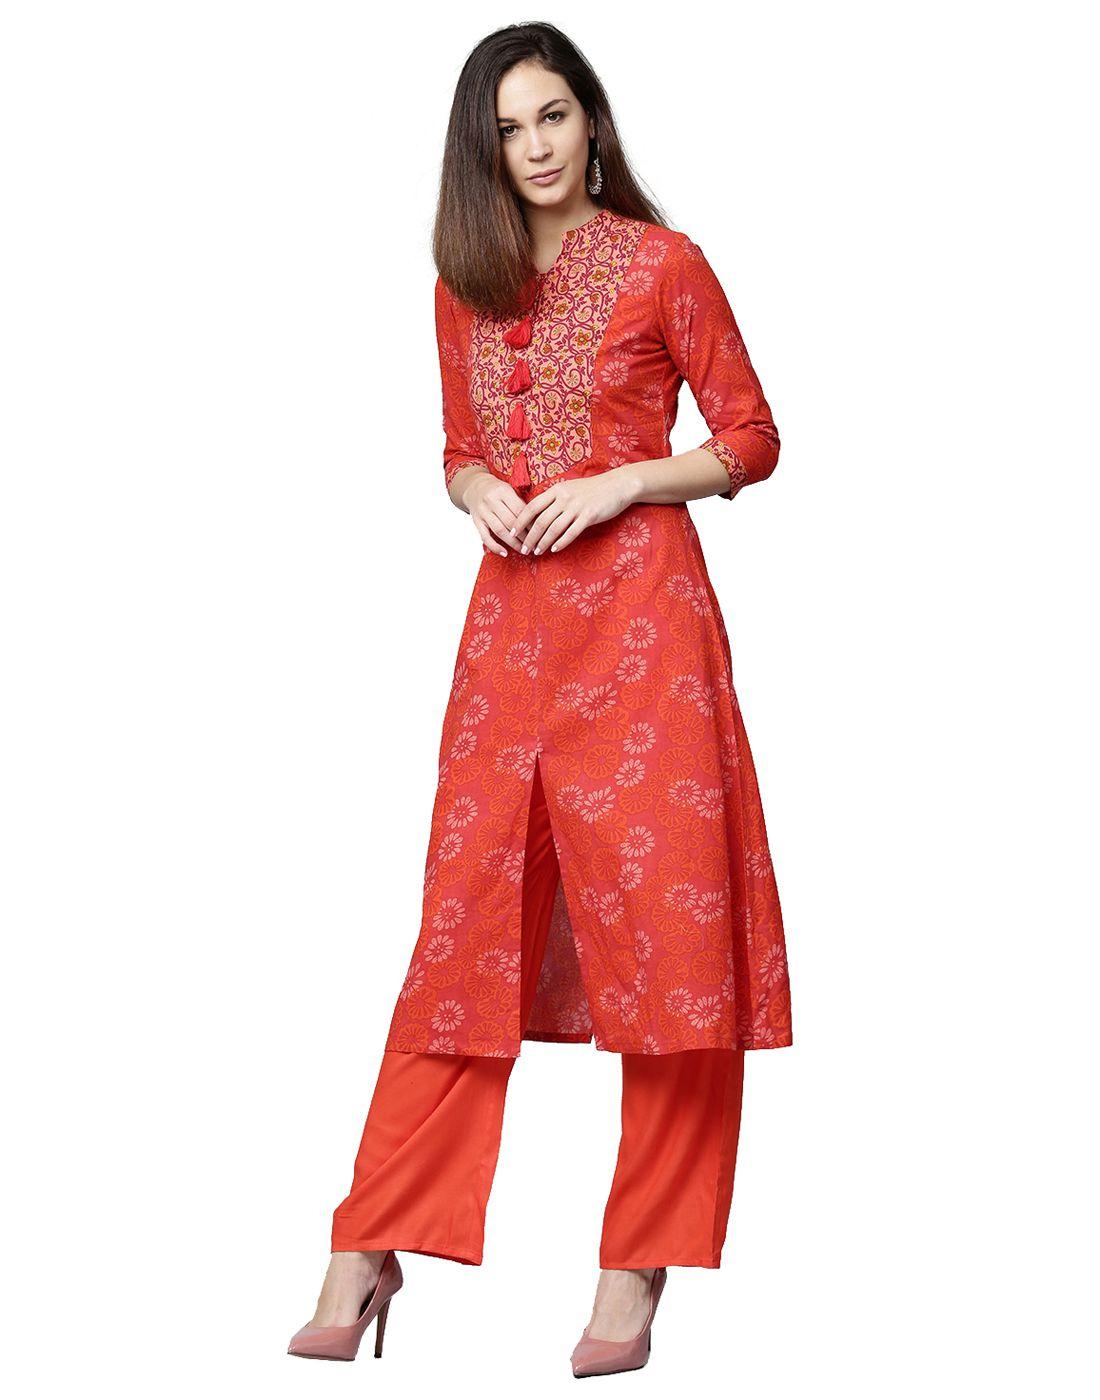 Jaipur Kurti Red Cotton A-line Stitched Suit